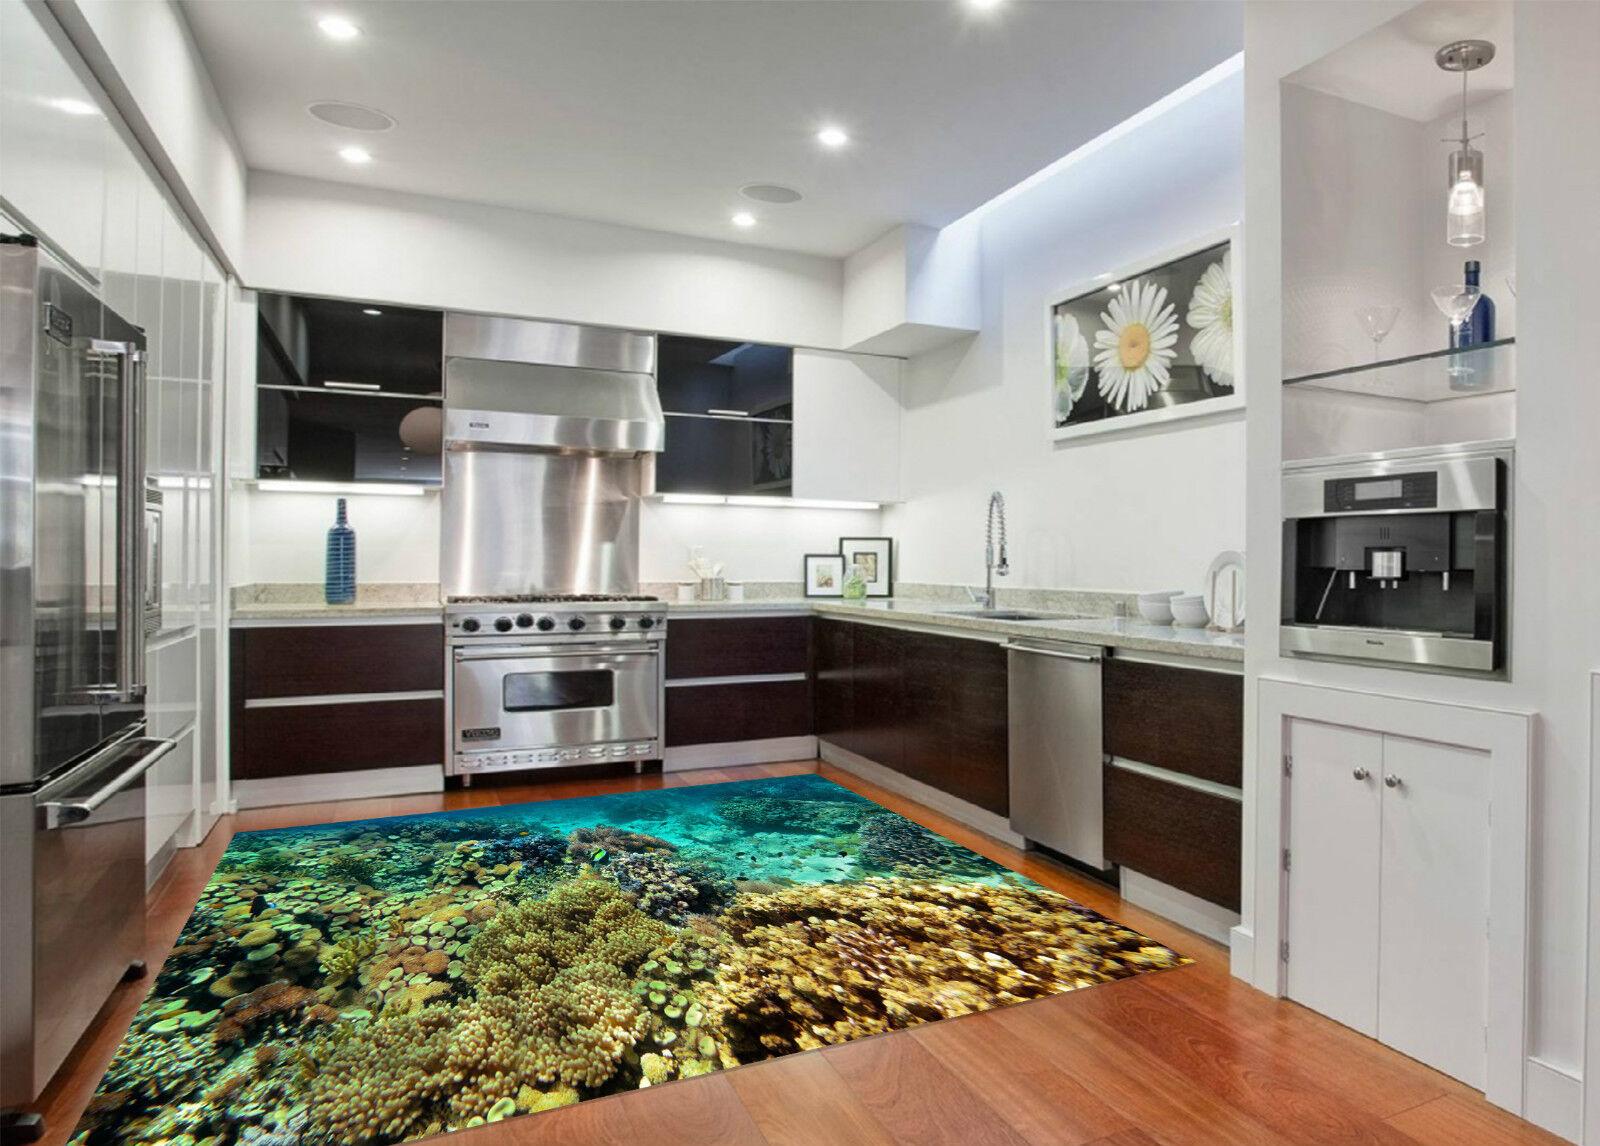 3D Fond Marin Corallien 088 Décor Mural Murale De De Murale Mur De Cuisine AJ WALLPAPER FR 90e5fe